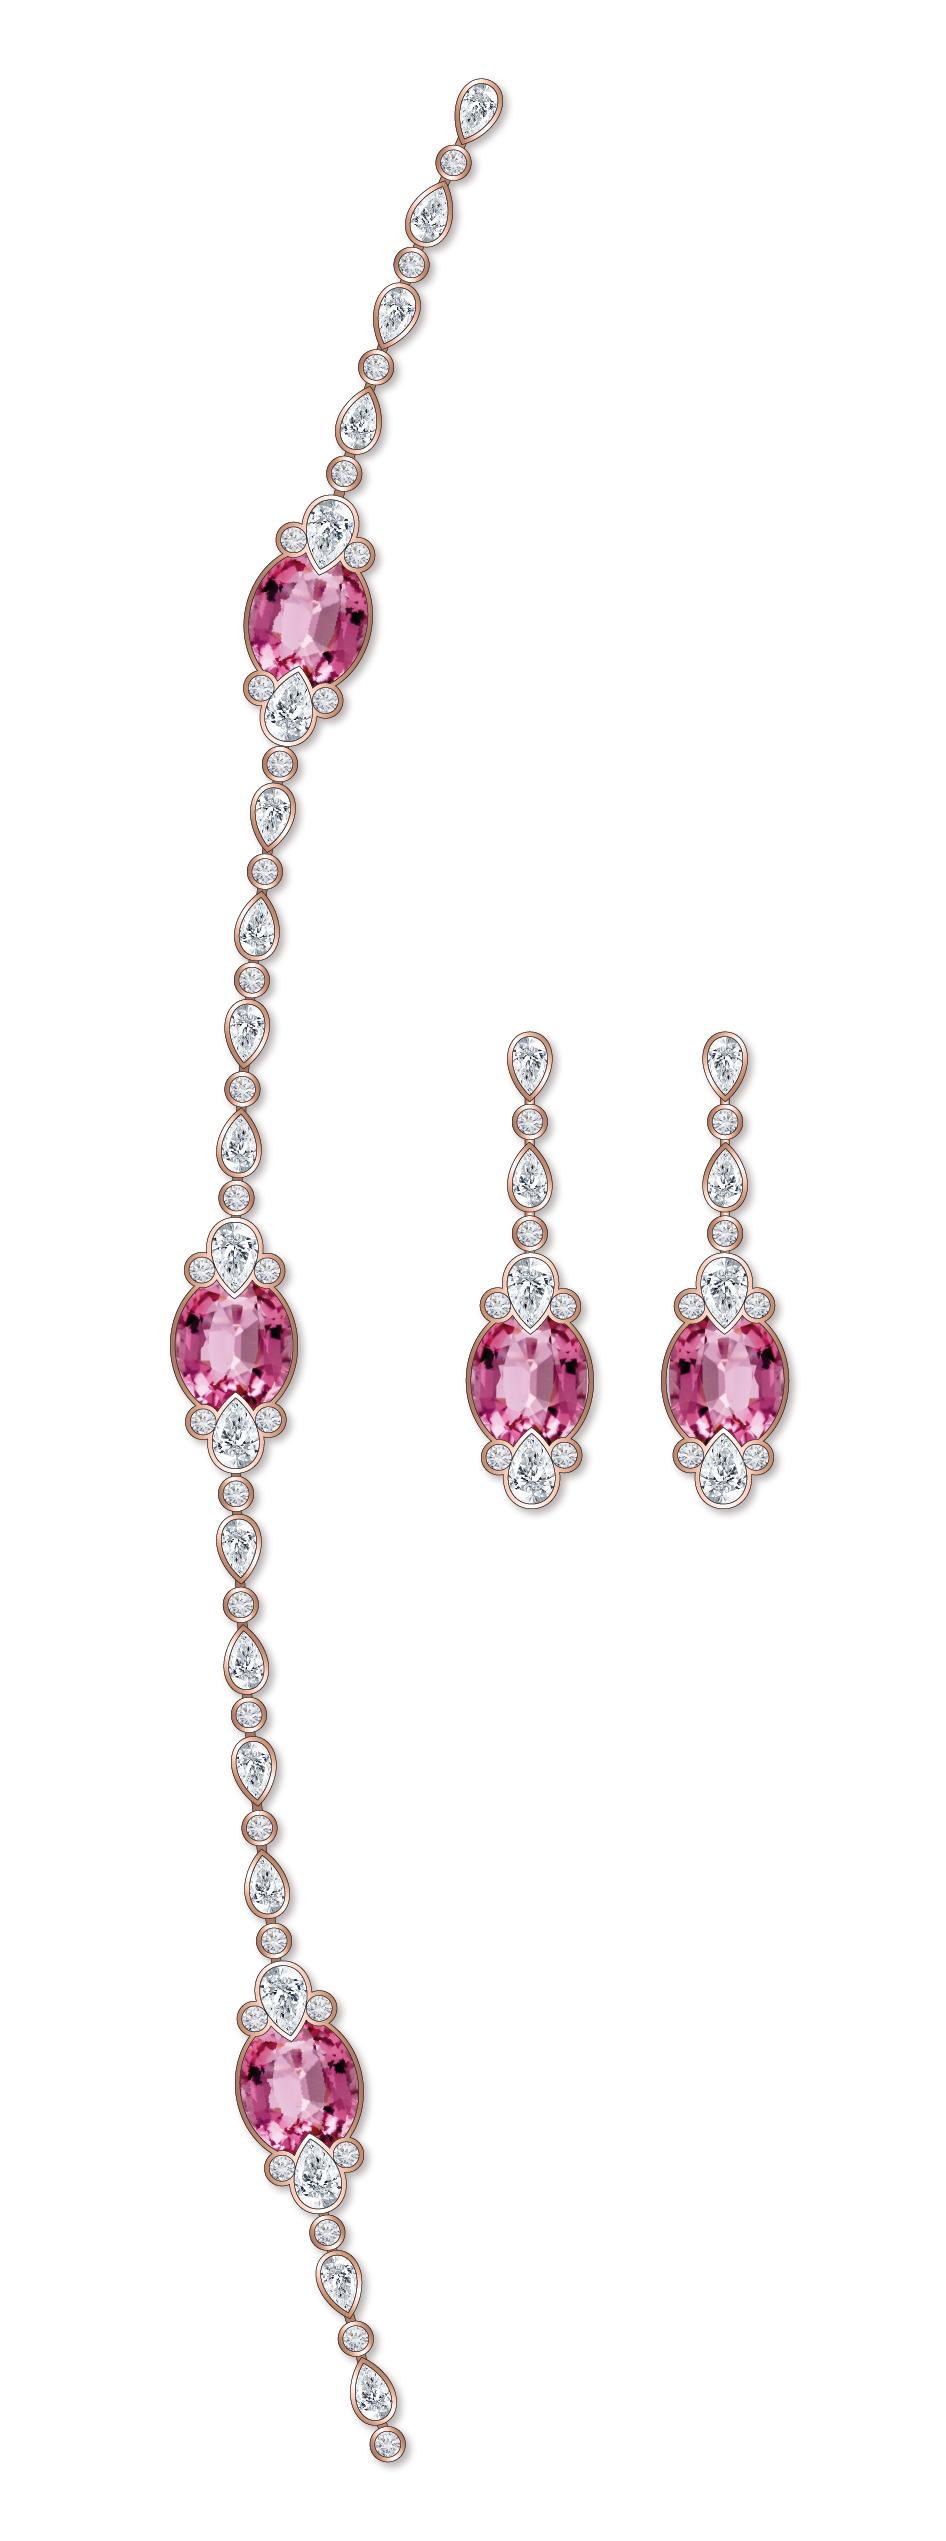 Dessin sautoir tourmalines roses diamants